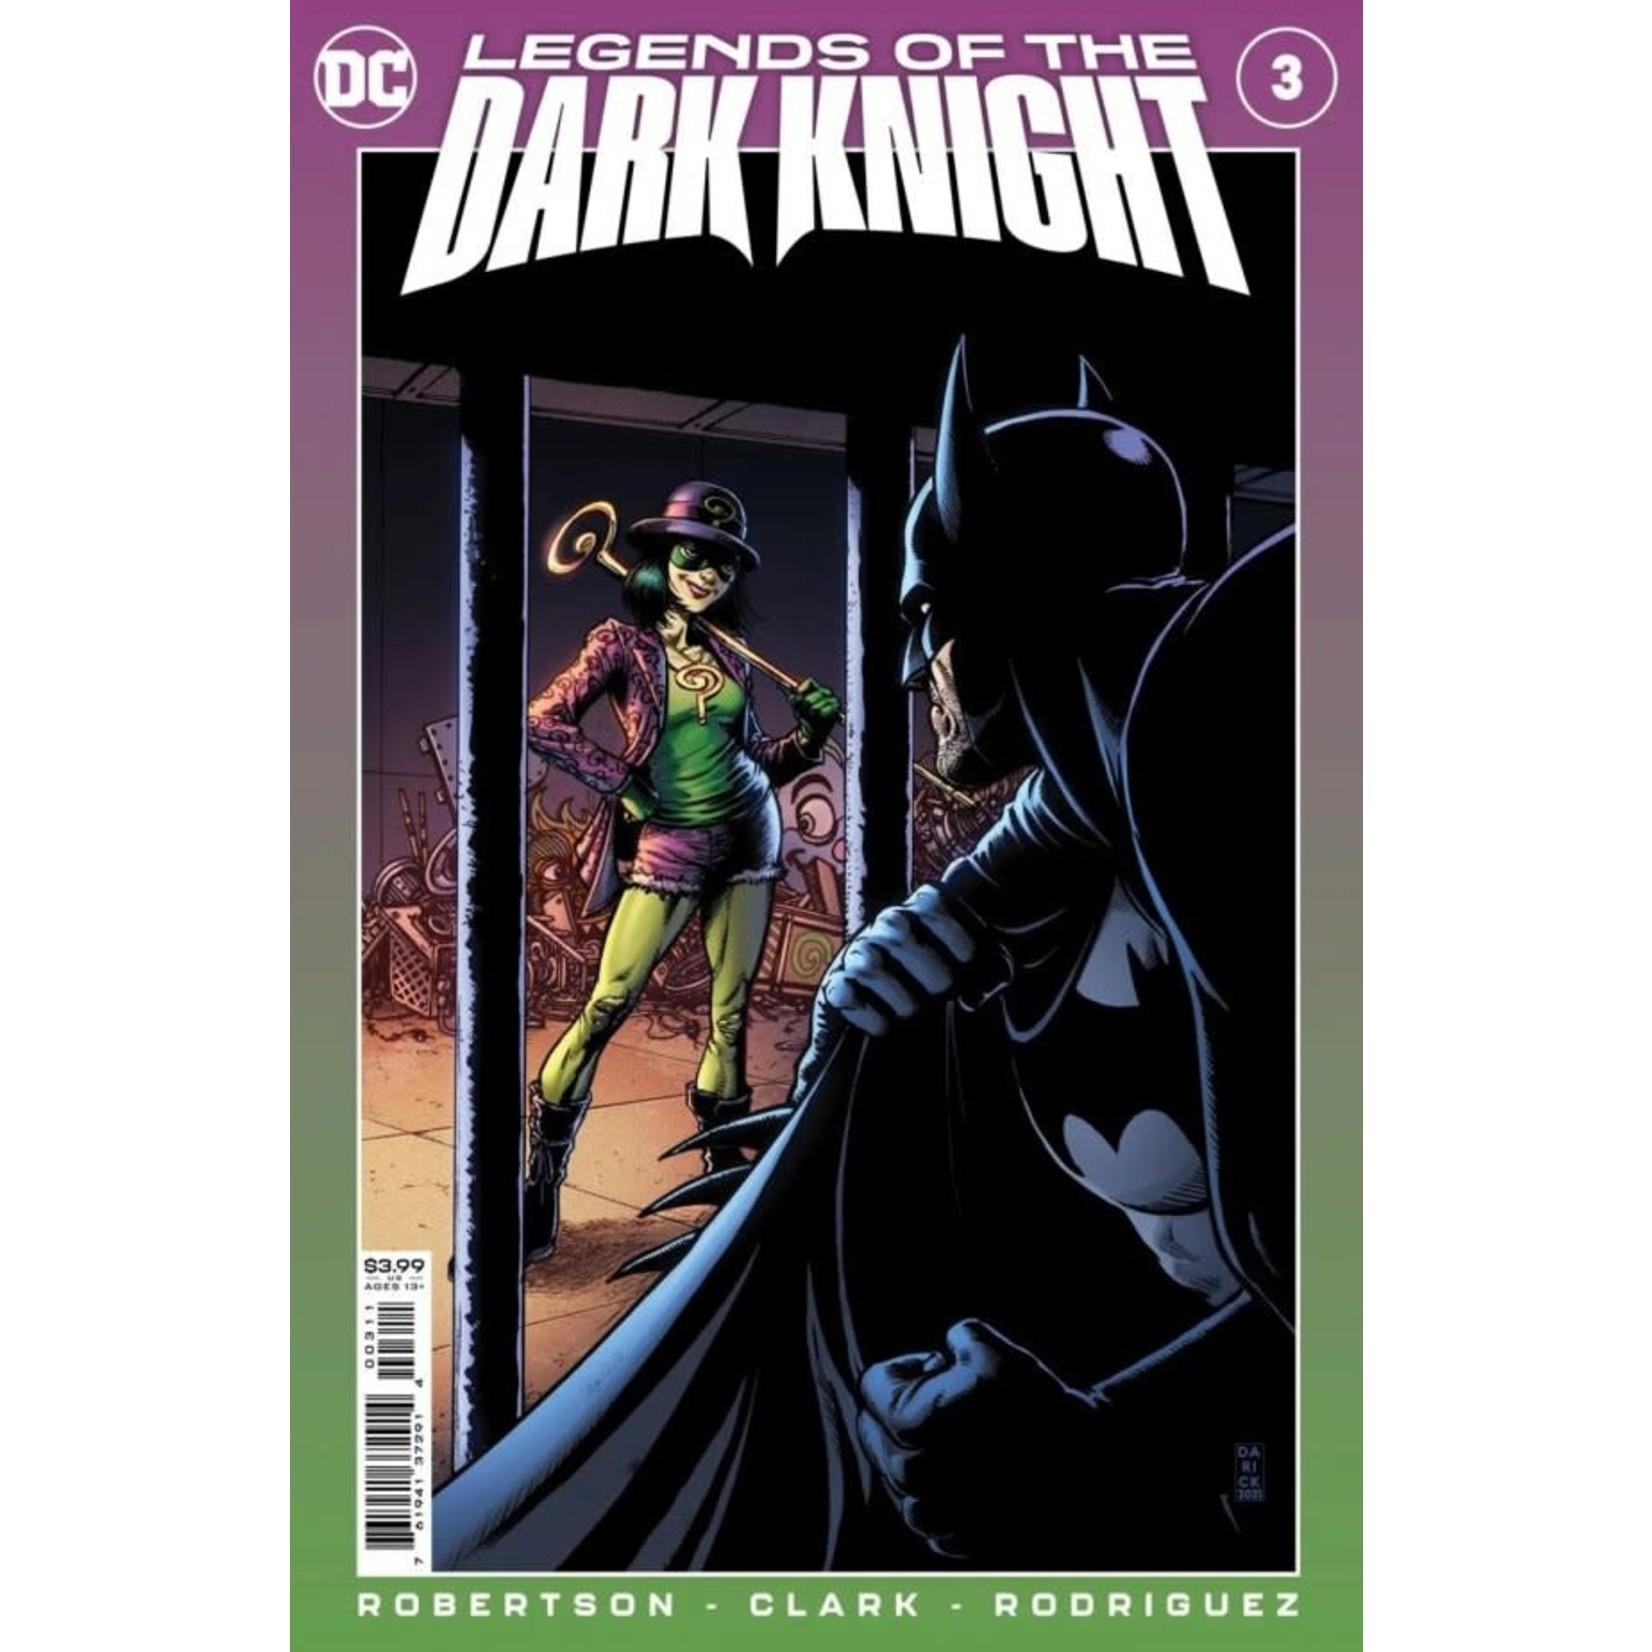 DC Comics Legends of the dark Knight #3